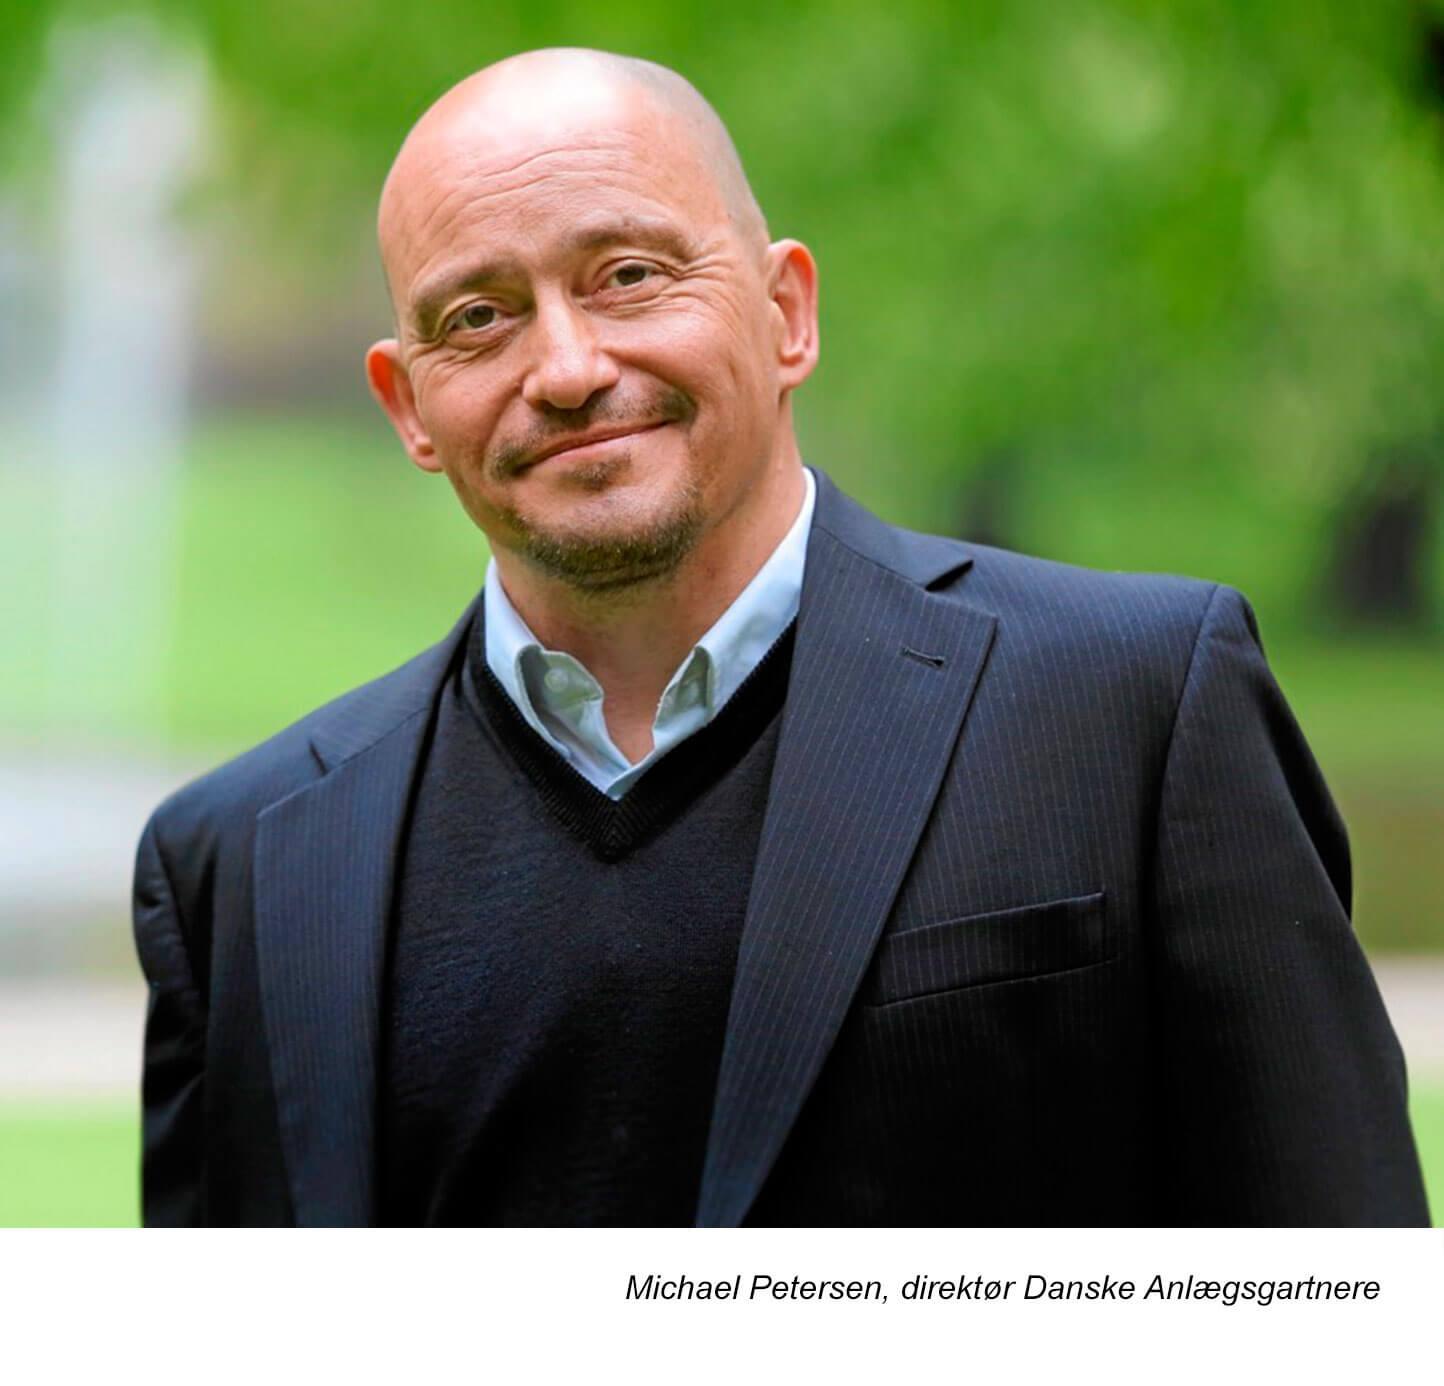 Michael Petersen, direktør Danske anlægsgartnere